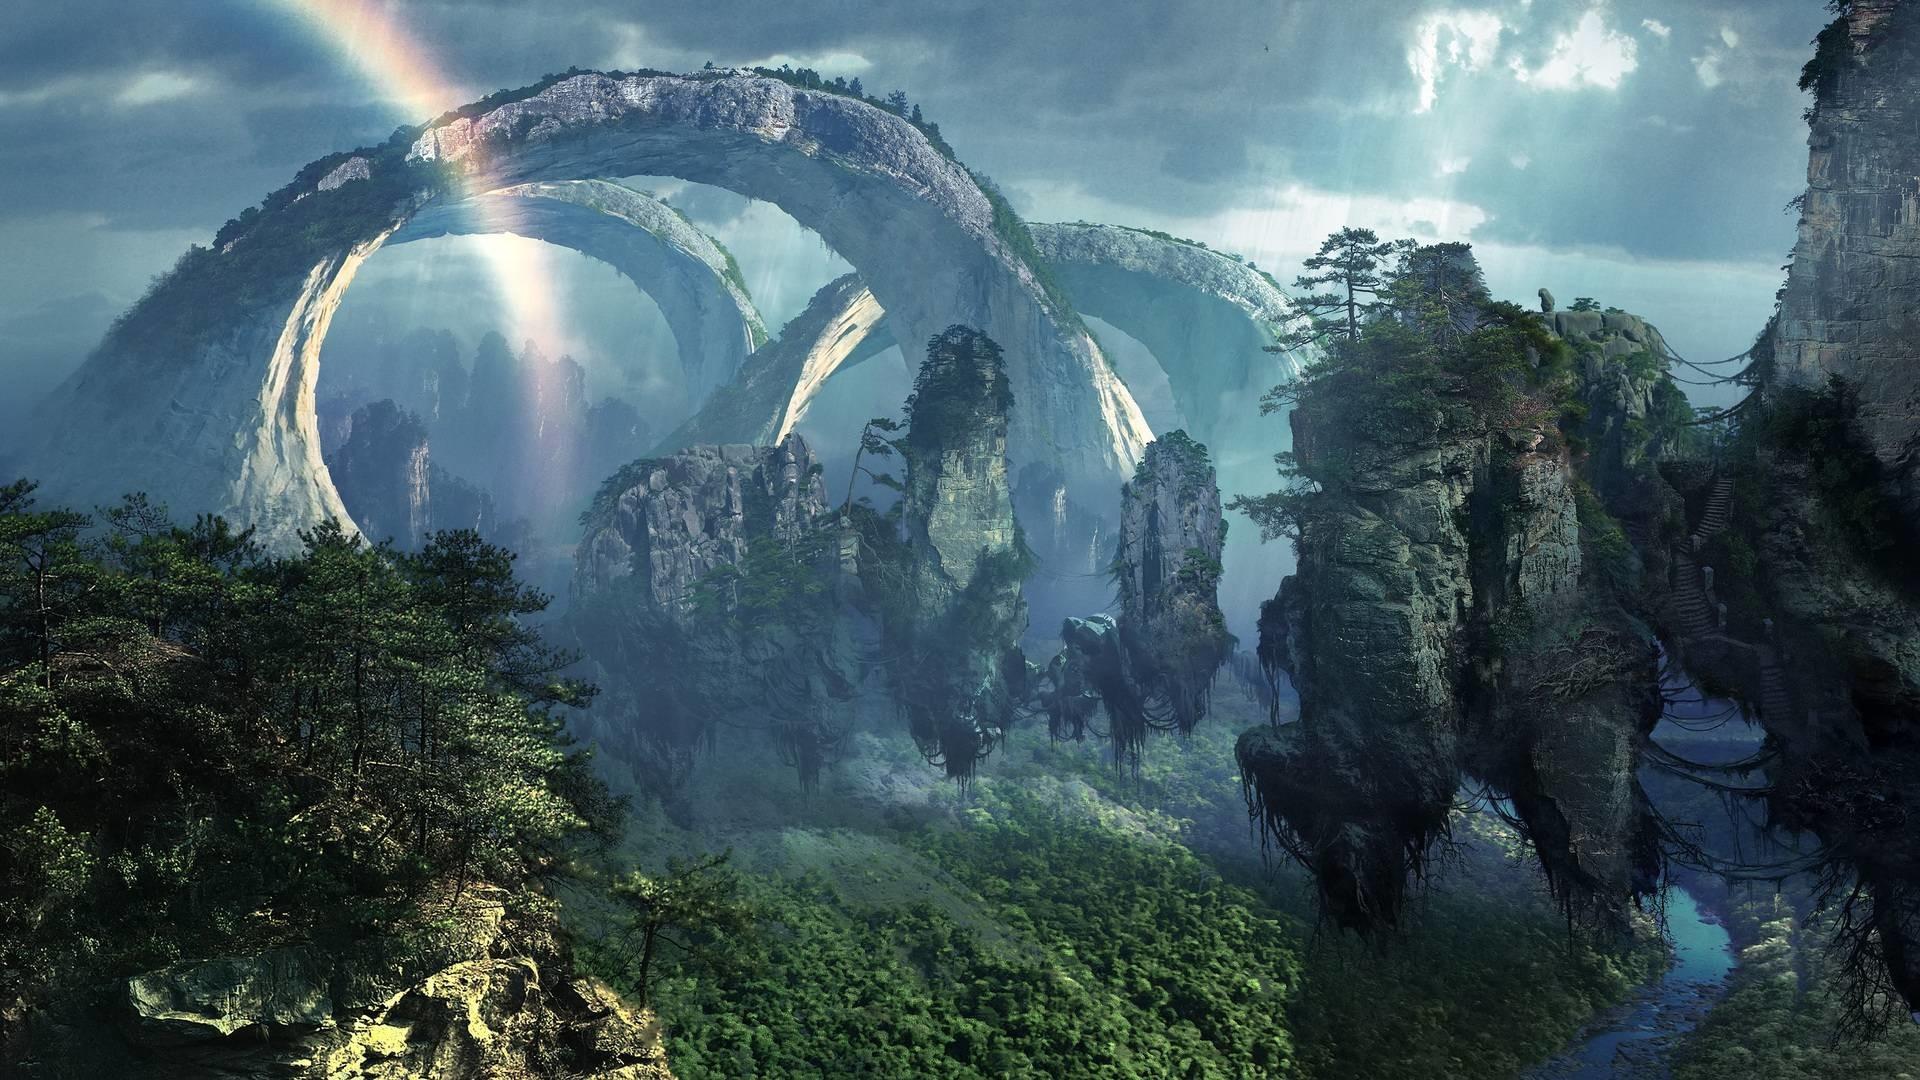 epic fantasy landscape wallpaper | vergapipe.